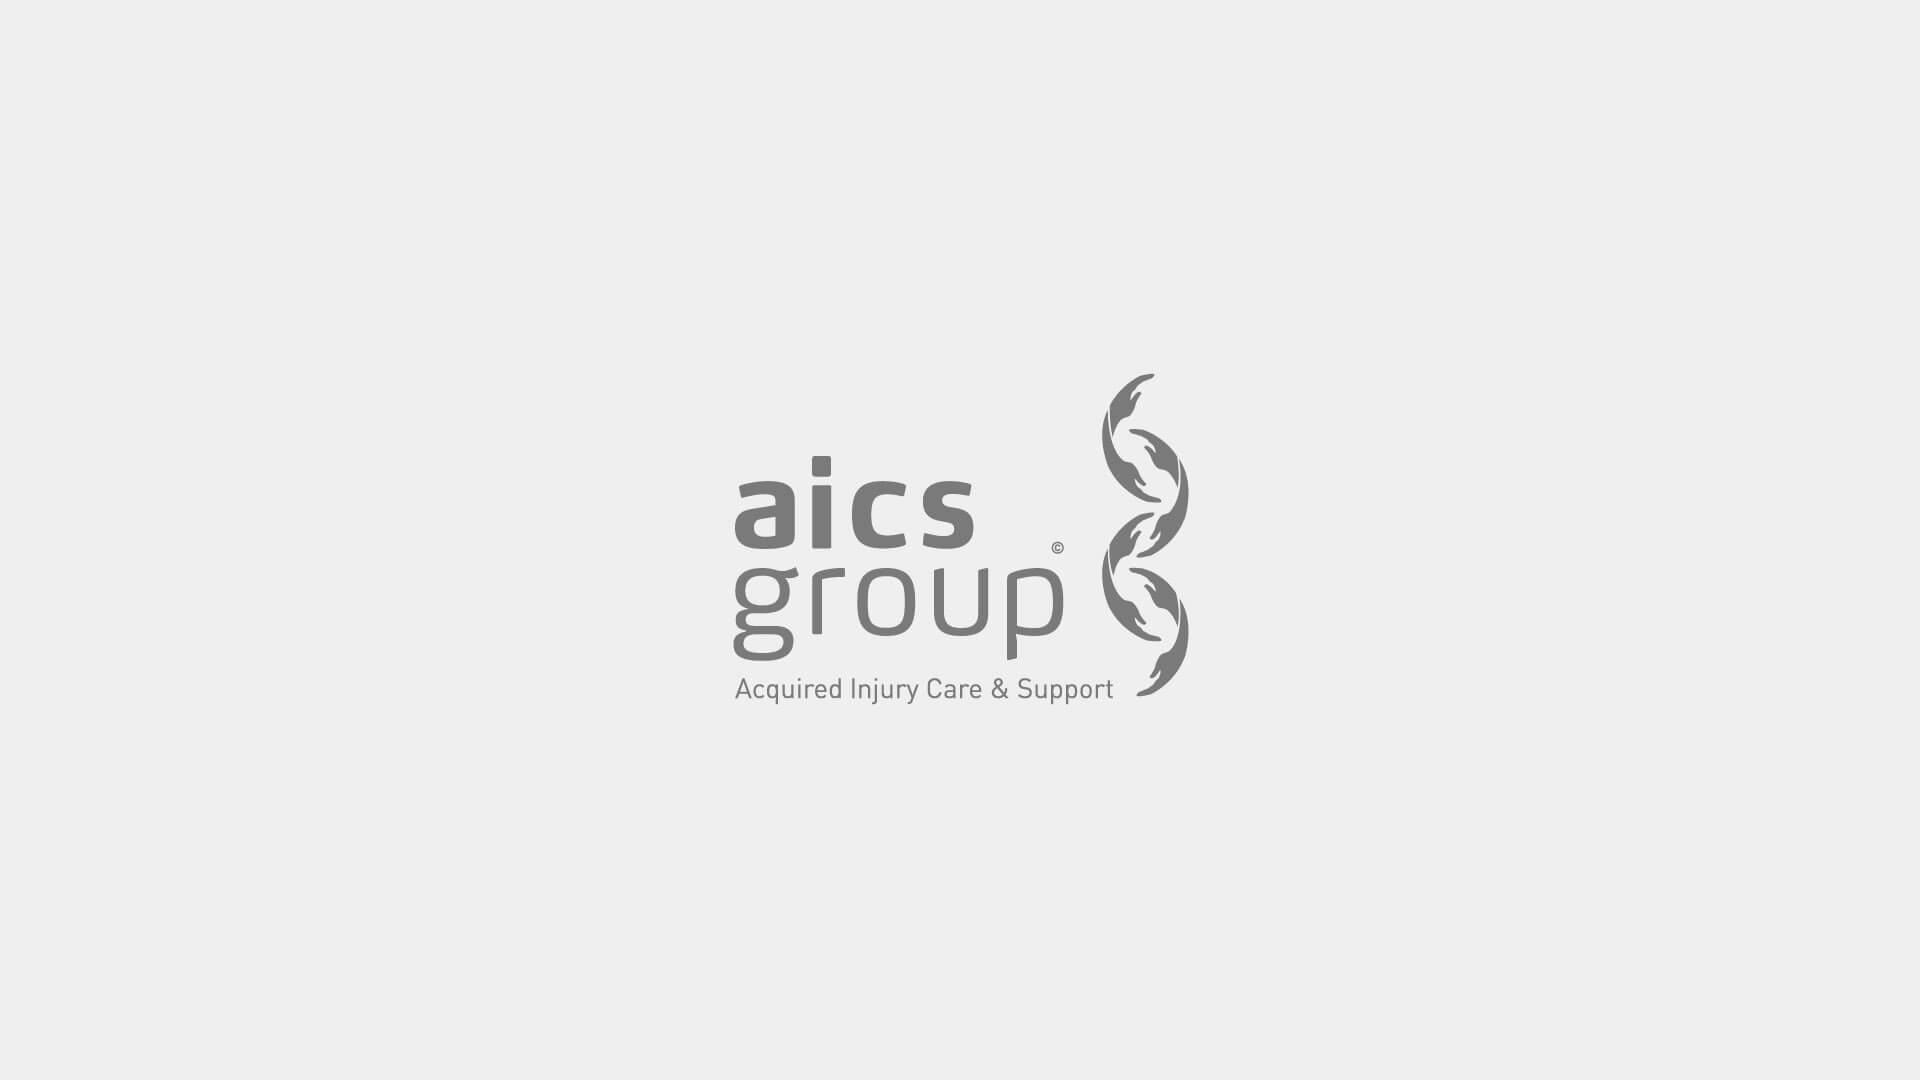 AICS_layout_06c